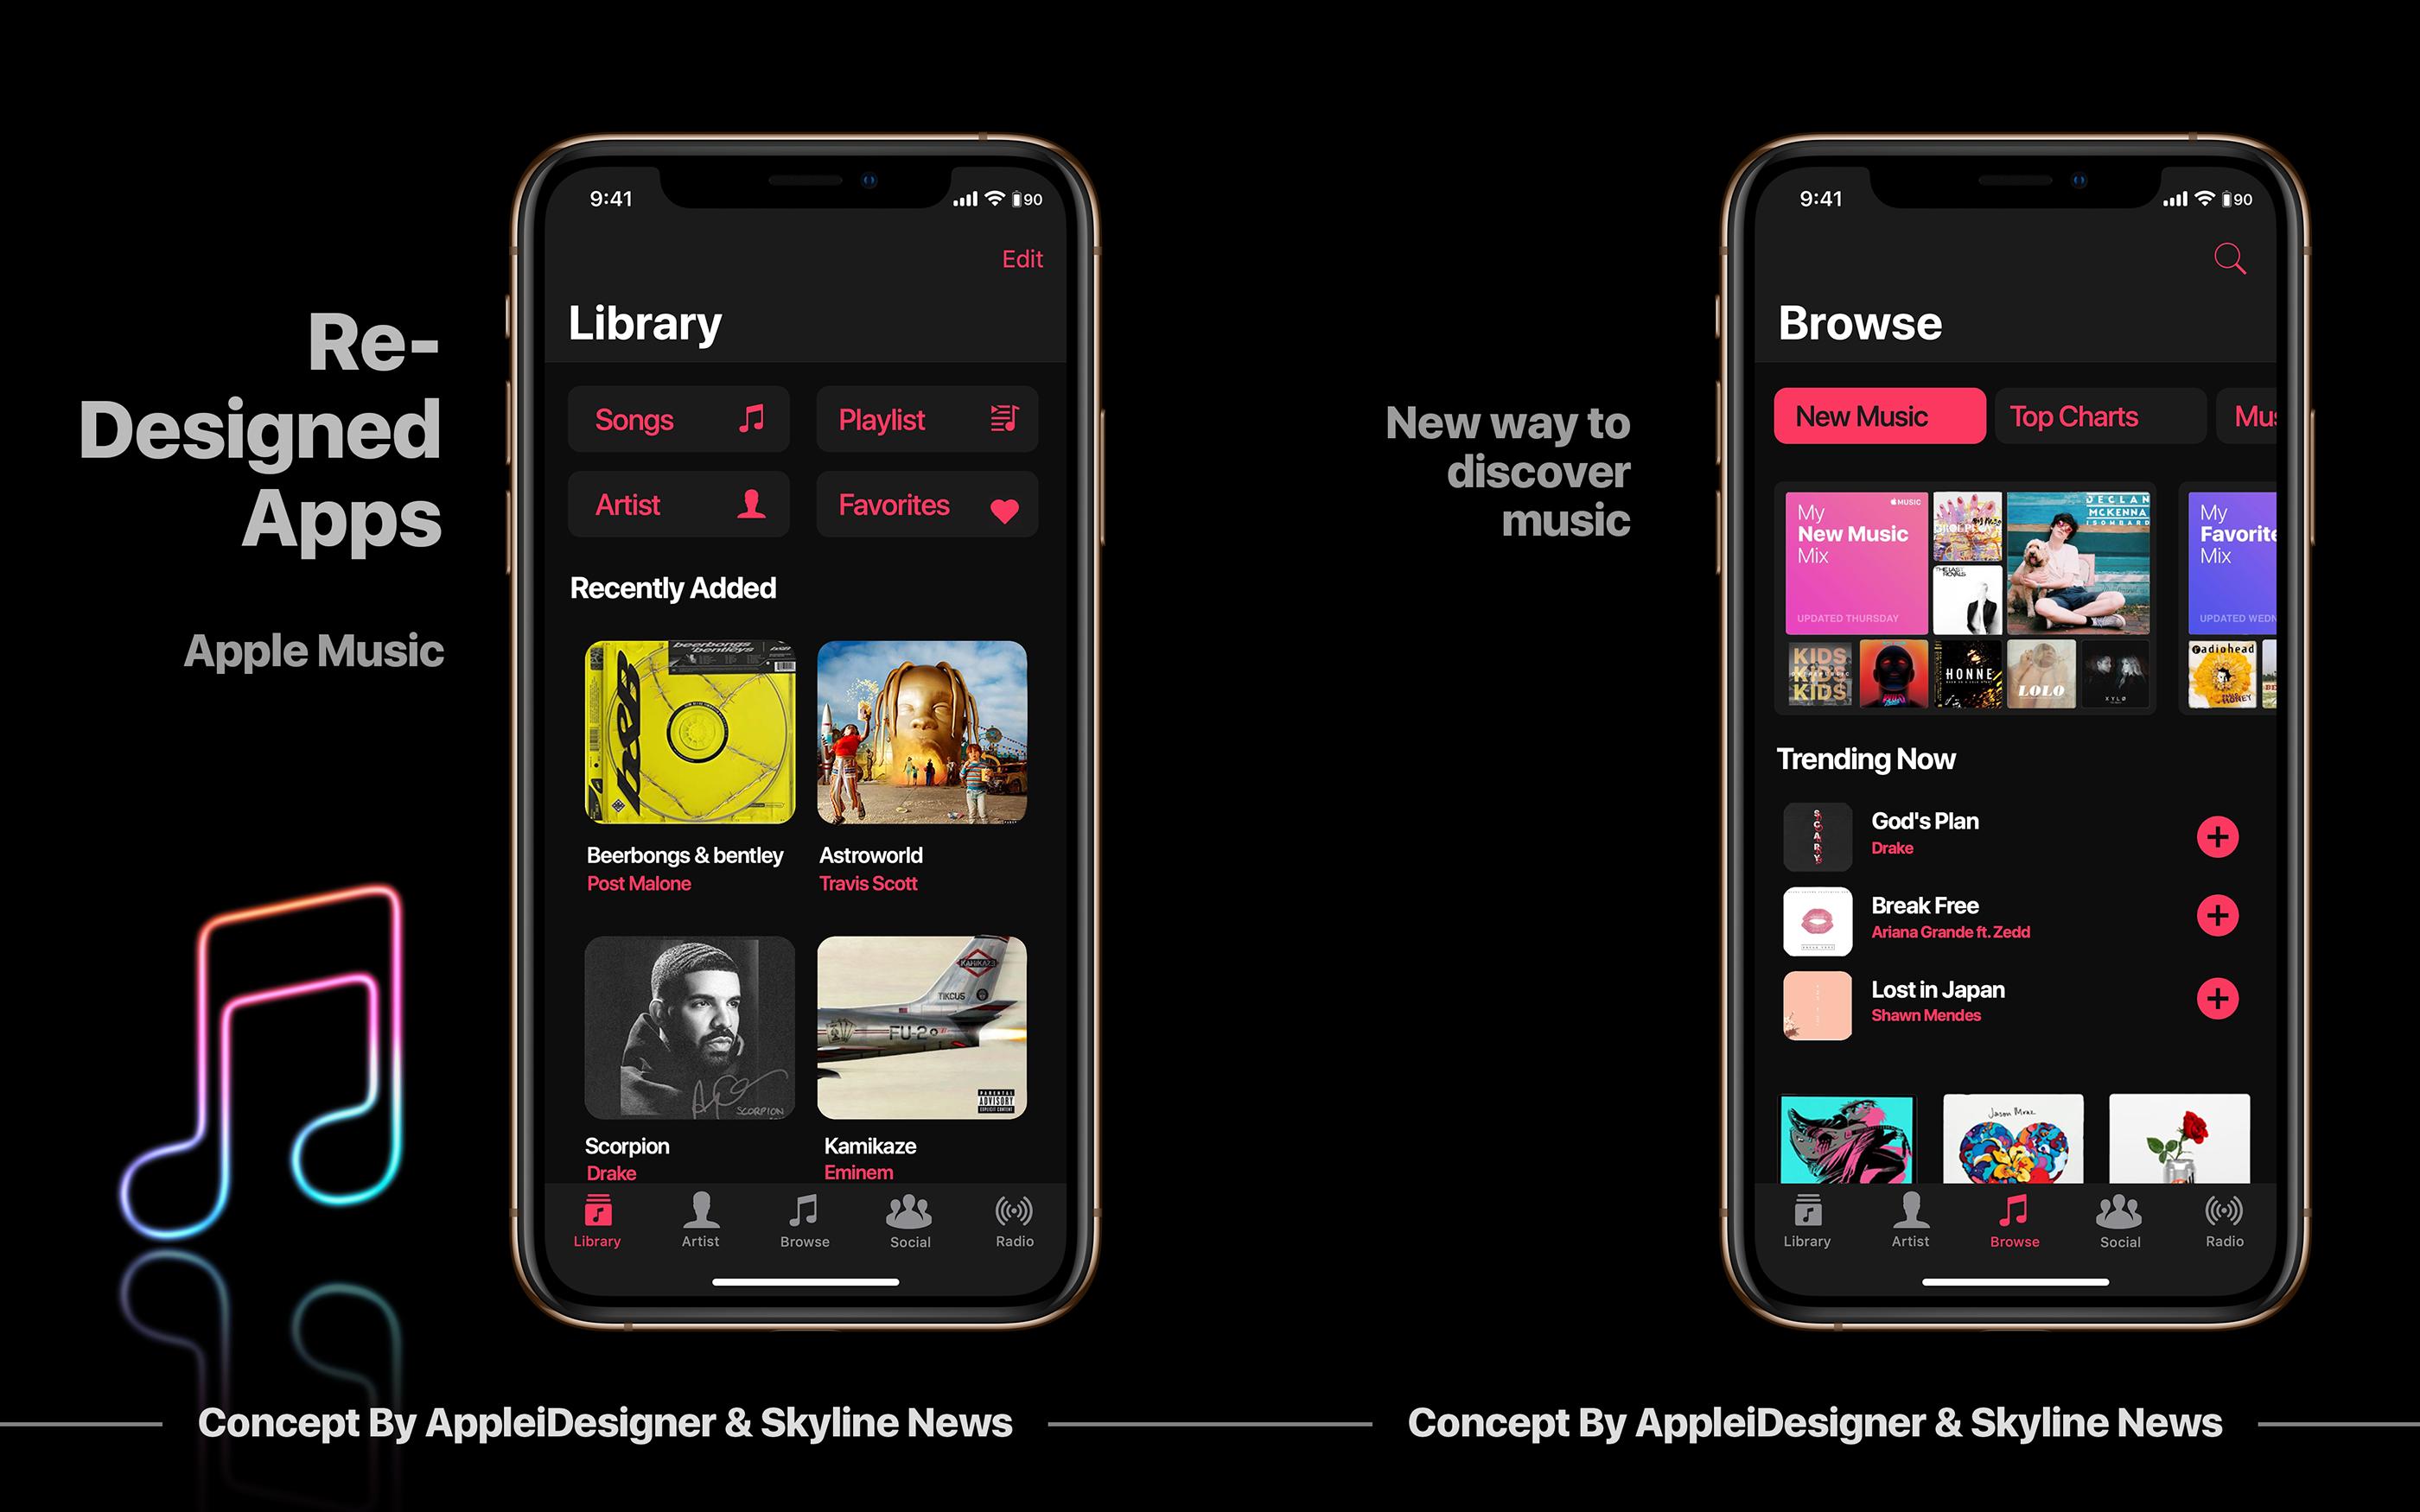 Ios 13 Concept By Appleidesigner Skyline News On Behance